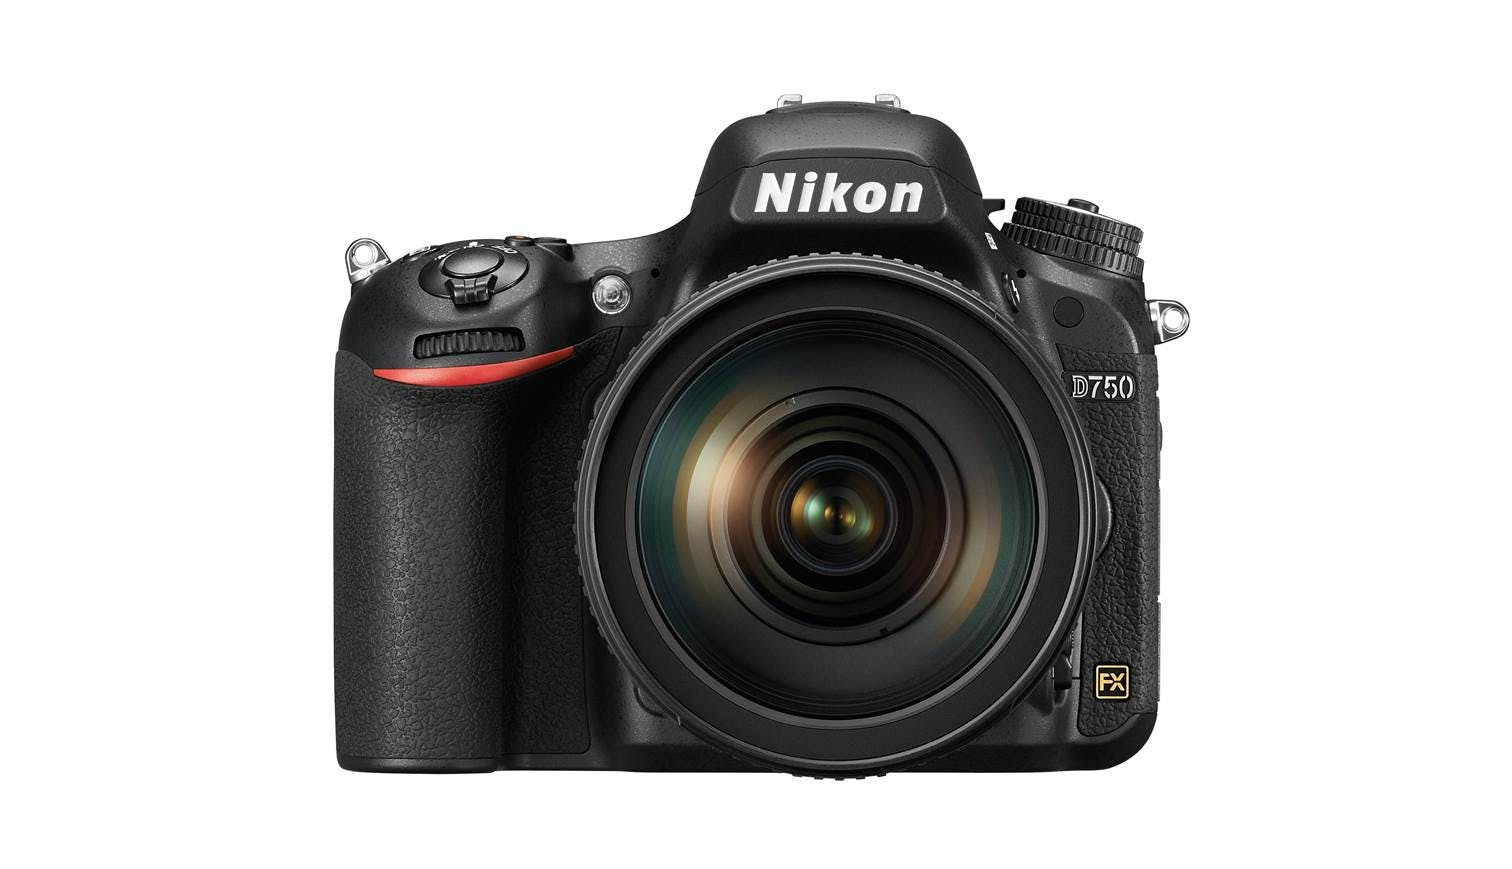 Camera Harvey Norman Dslr Cameras dslr camera nikon canon harvey norman d750 with 24 120mm f4g ed vr lens